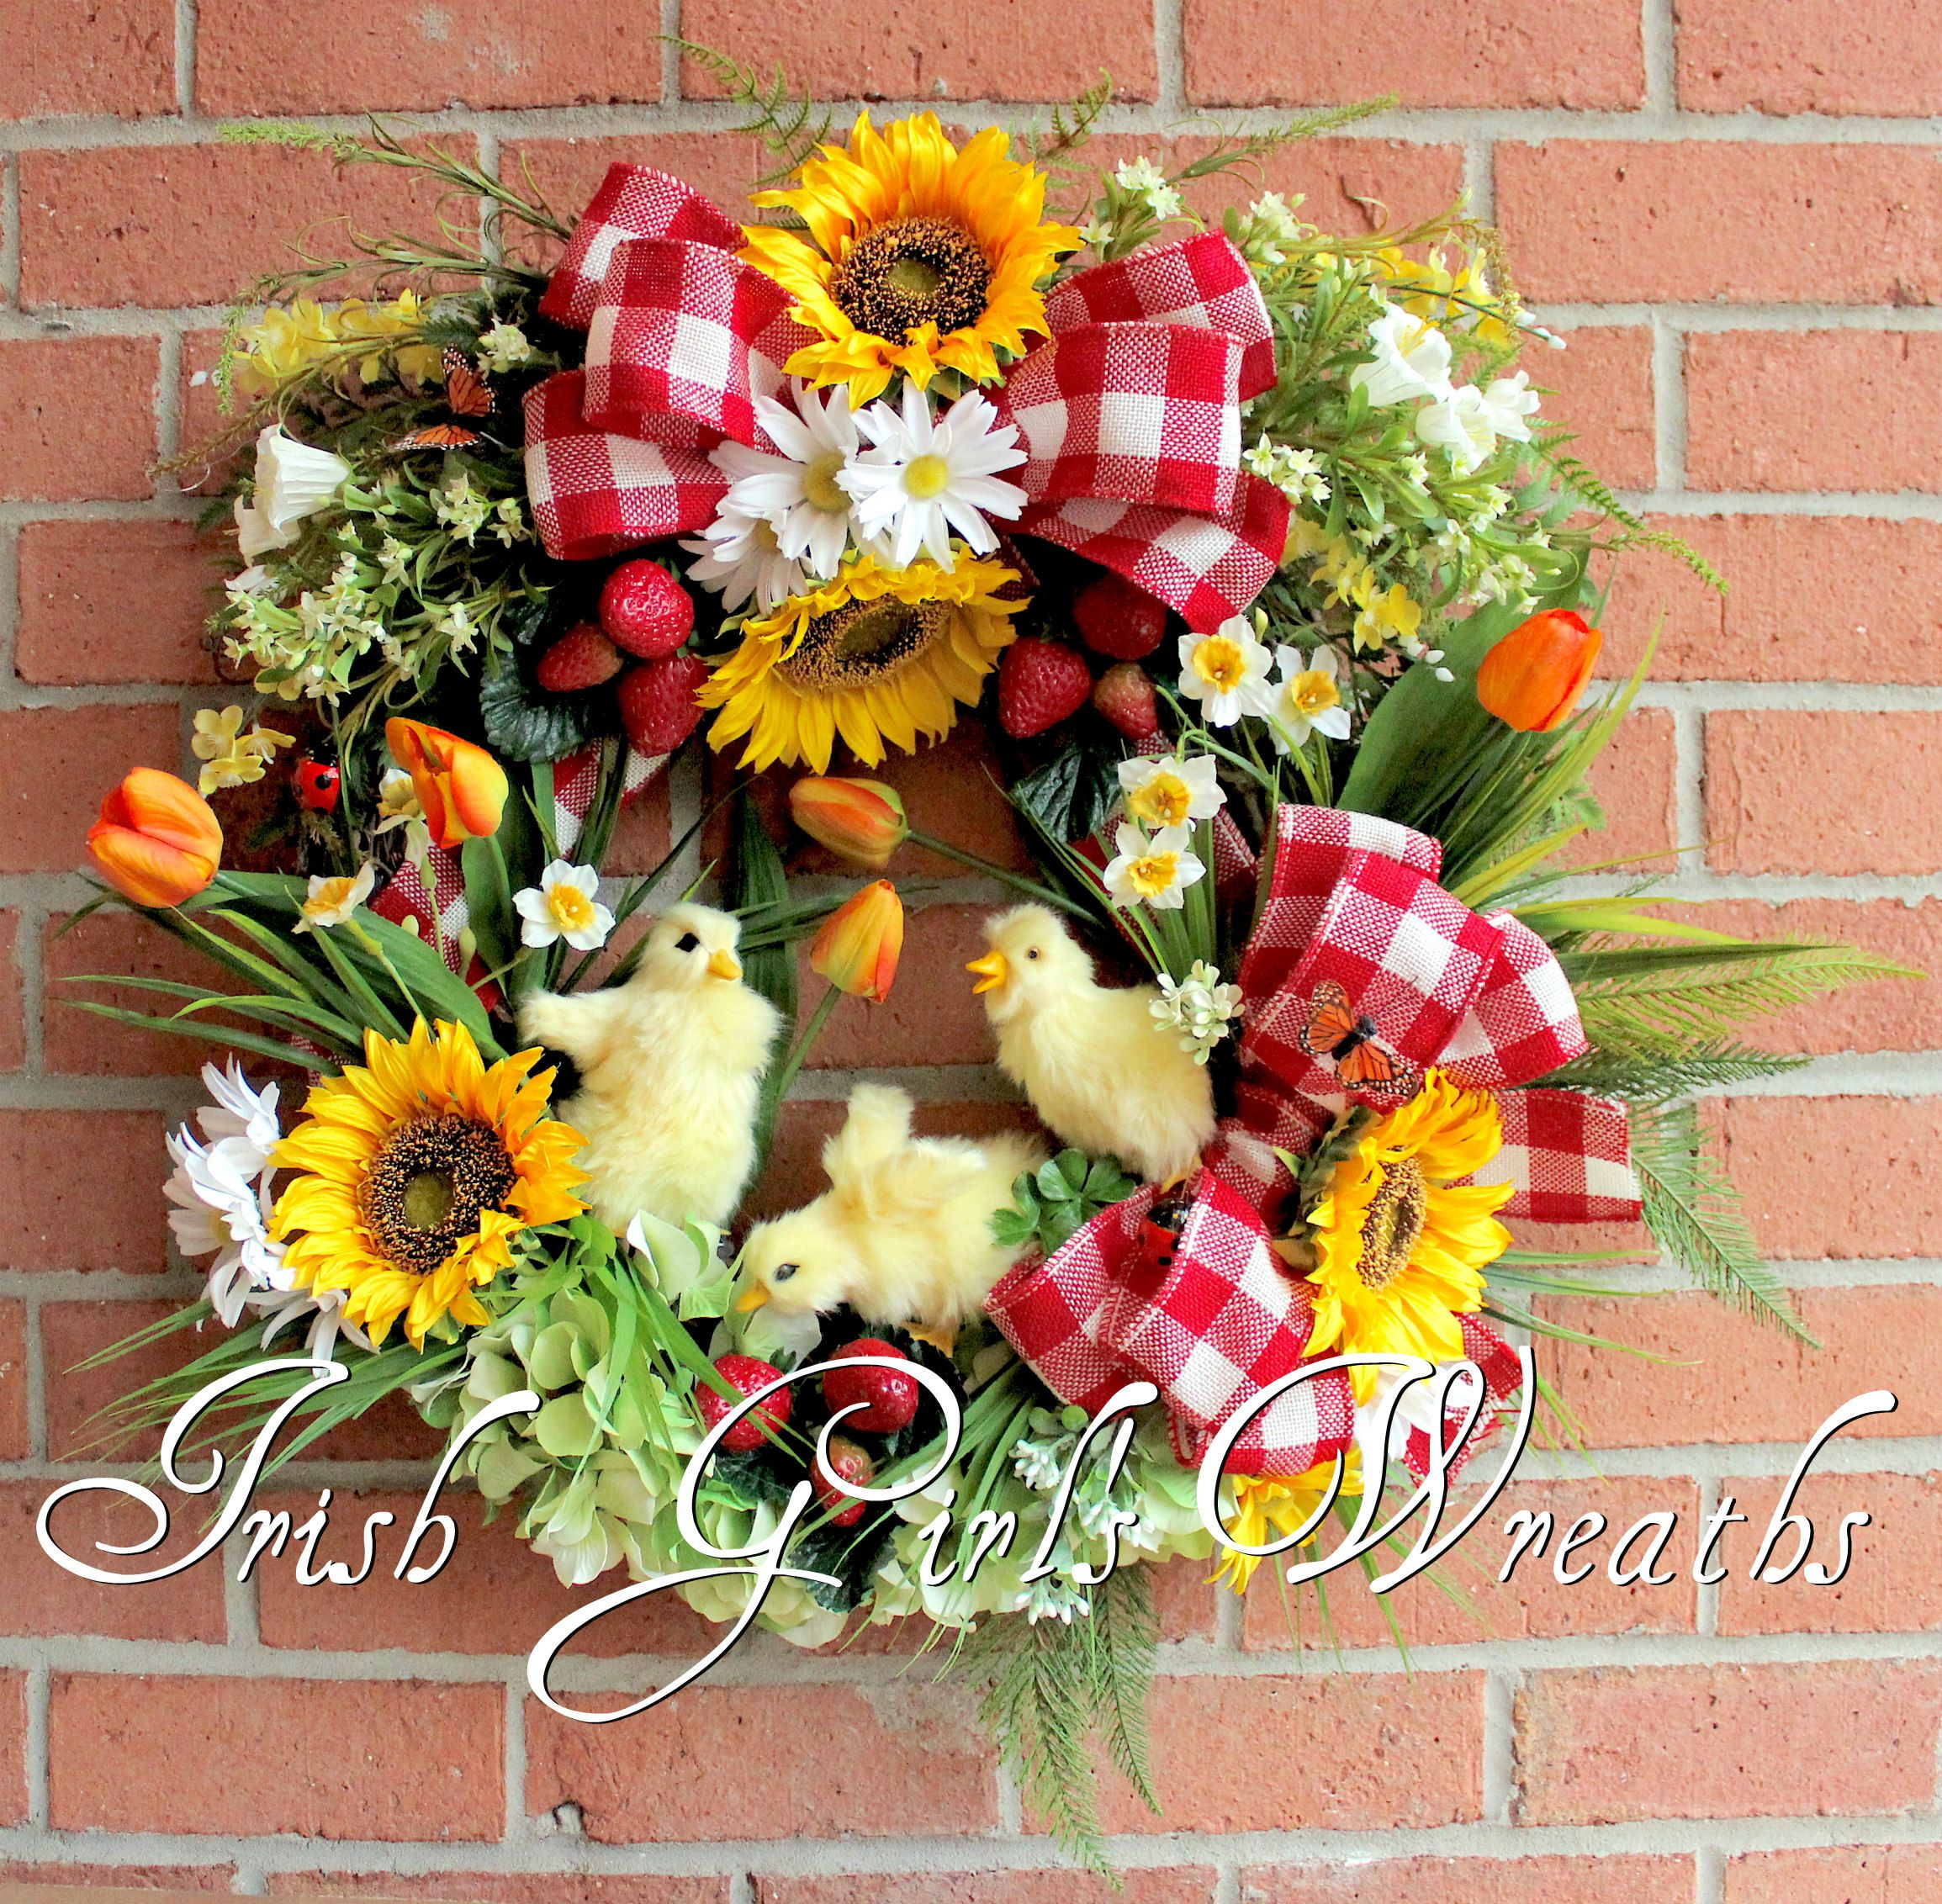 Americana/Country Irish Girl's Wreaths Wreaths